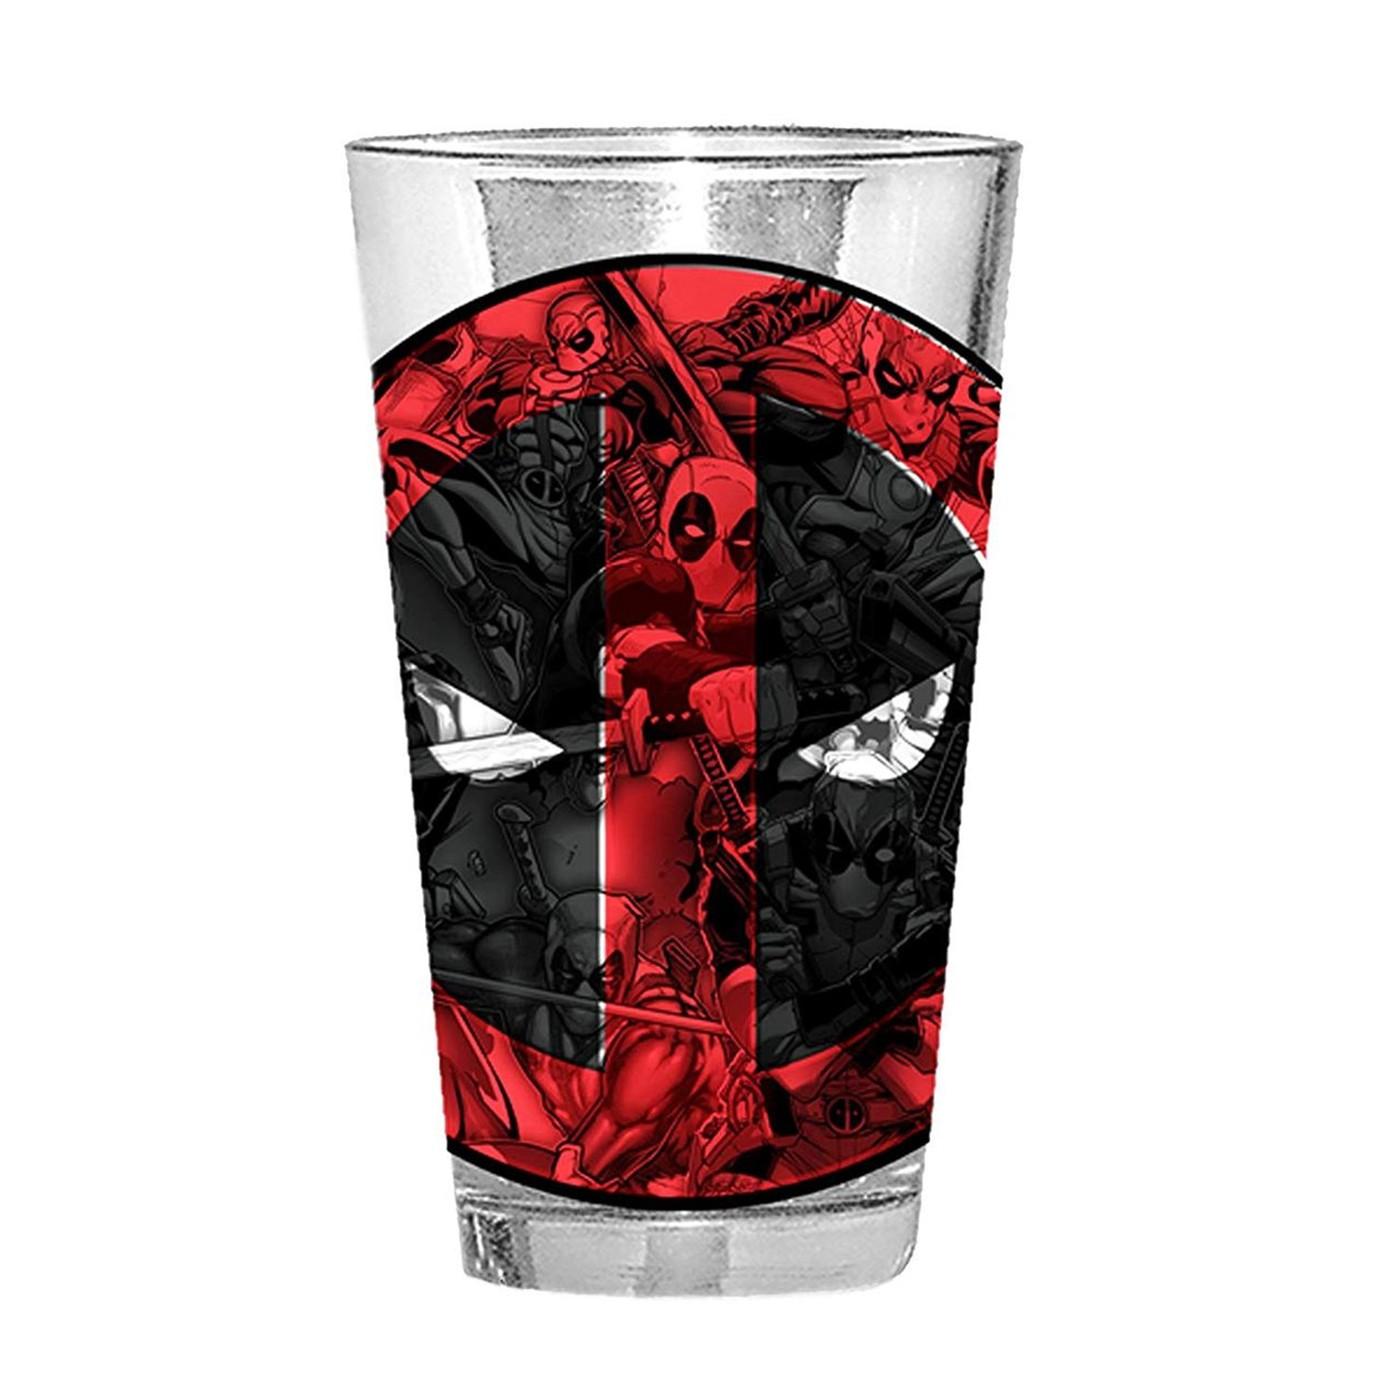 Deadpool Action Pint Glass